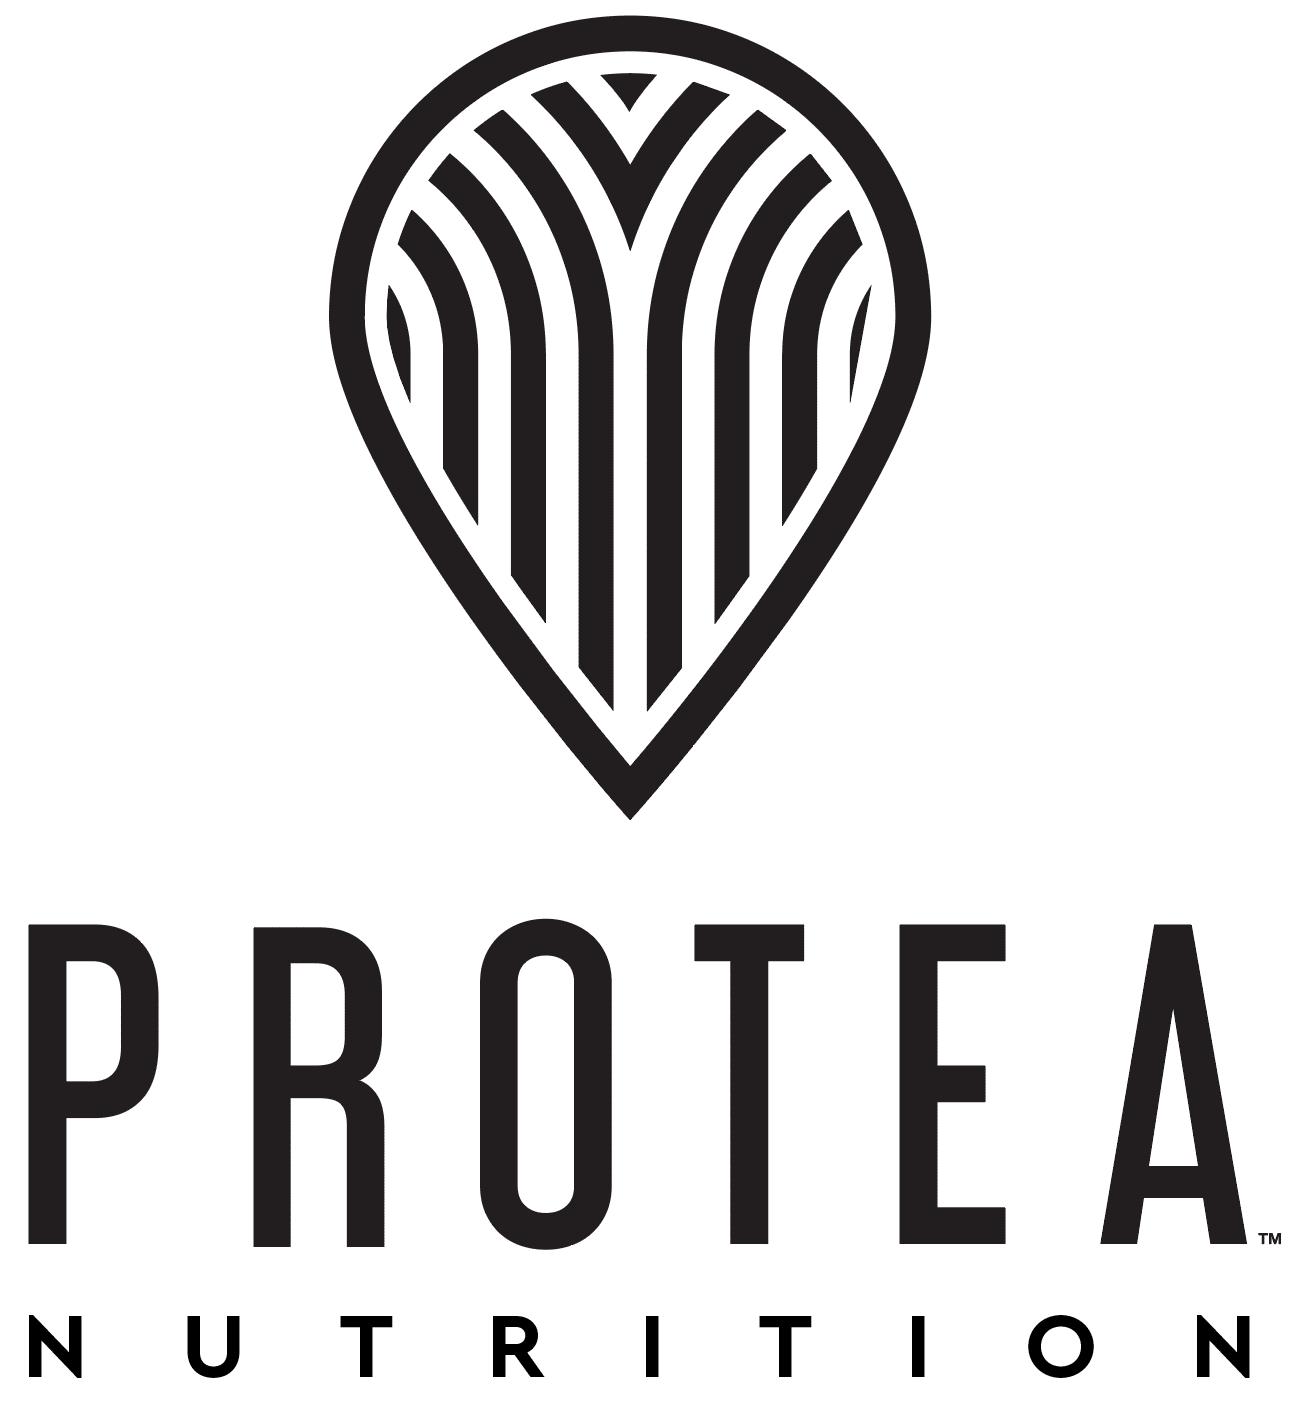 Protean Nutrition